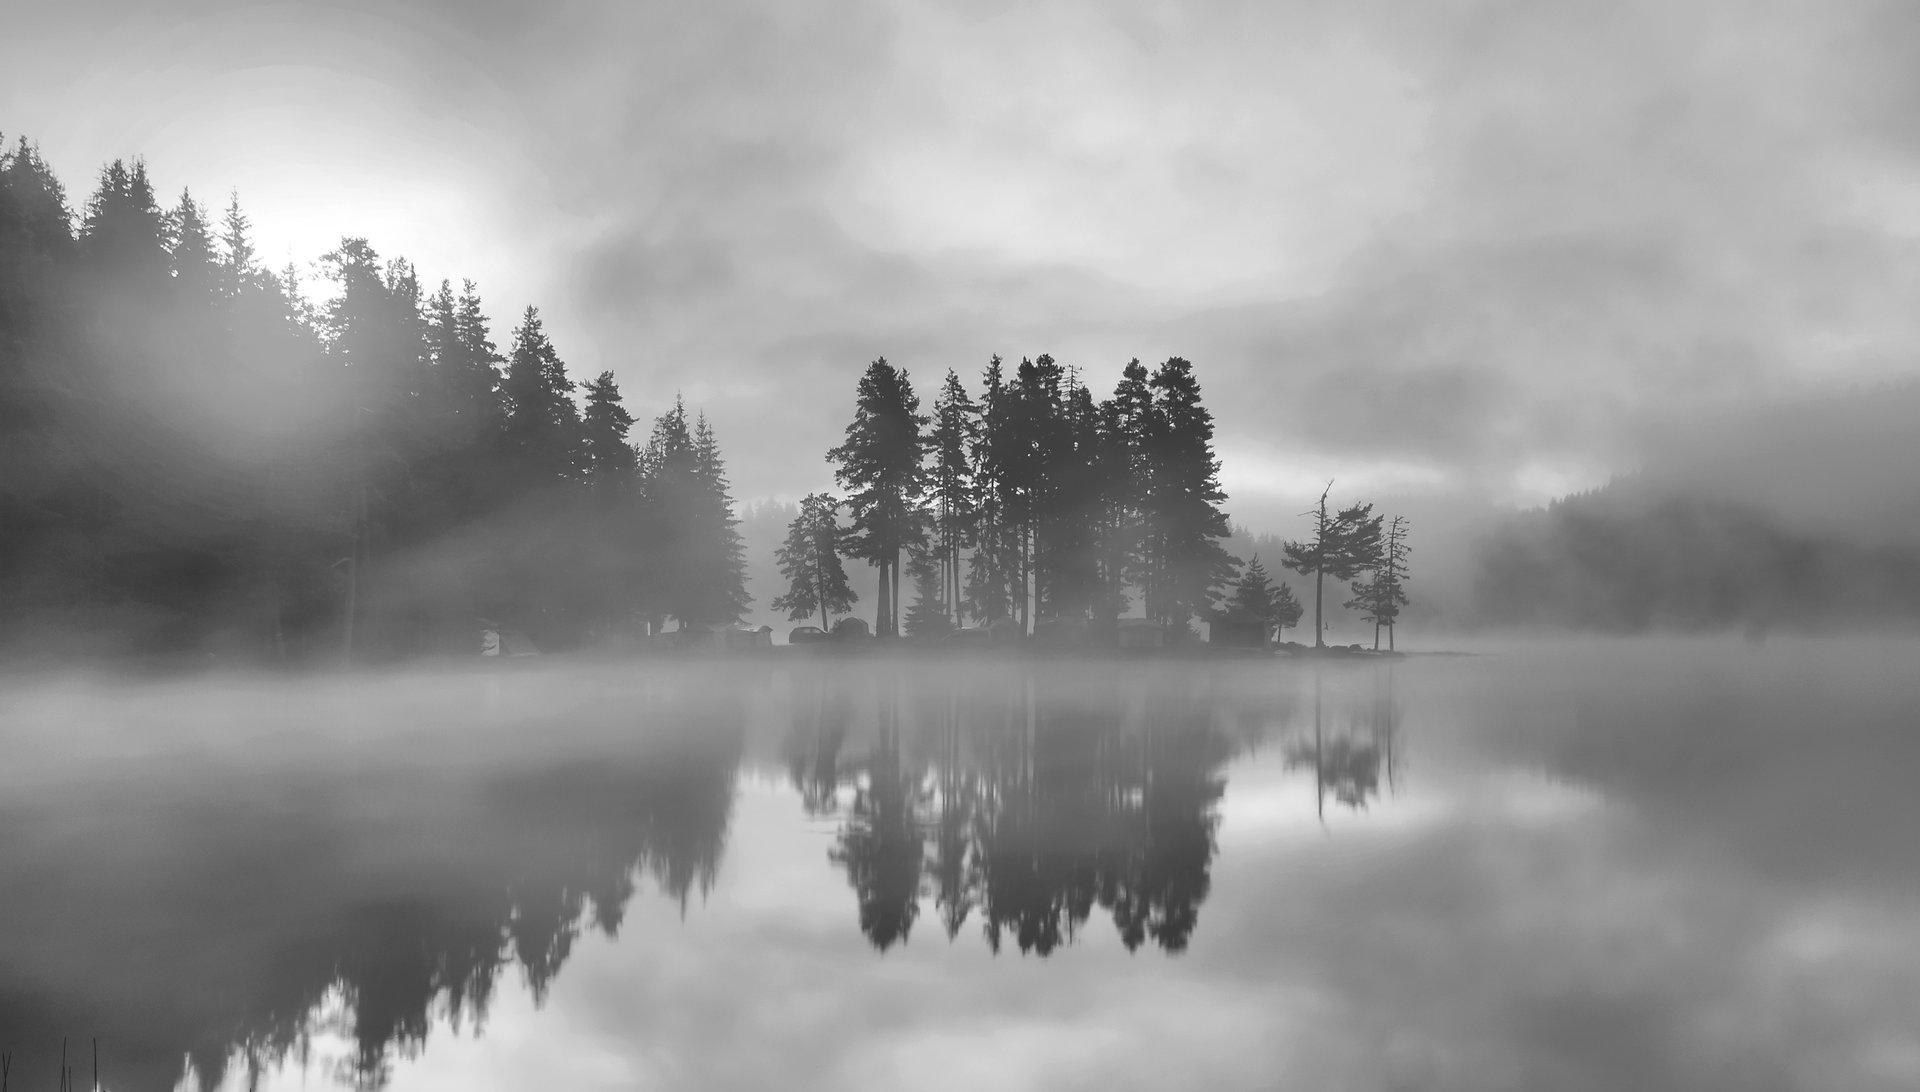 Photo in Nature | Author Rumen Topalov - rtopalov1 | PHOTO FORUM